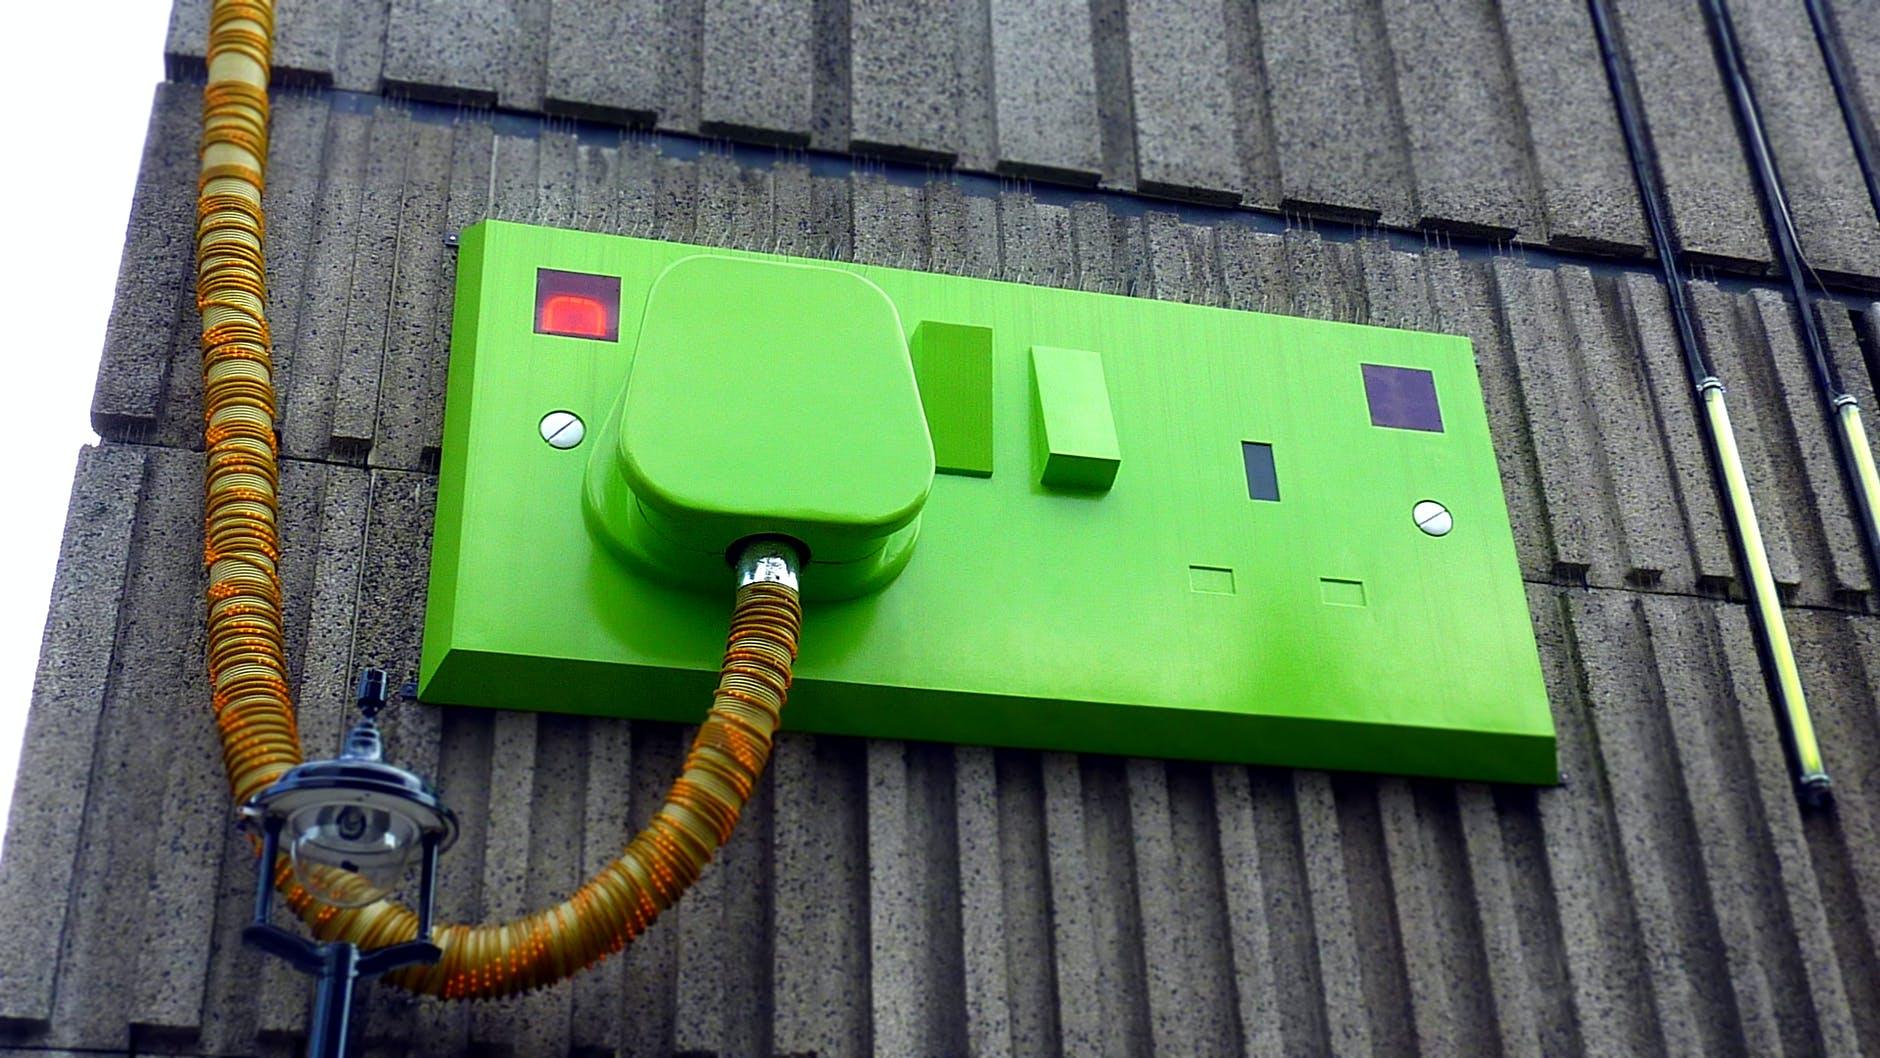 green rectangular corded machine on grey wall during daytime